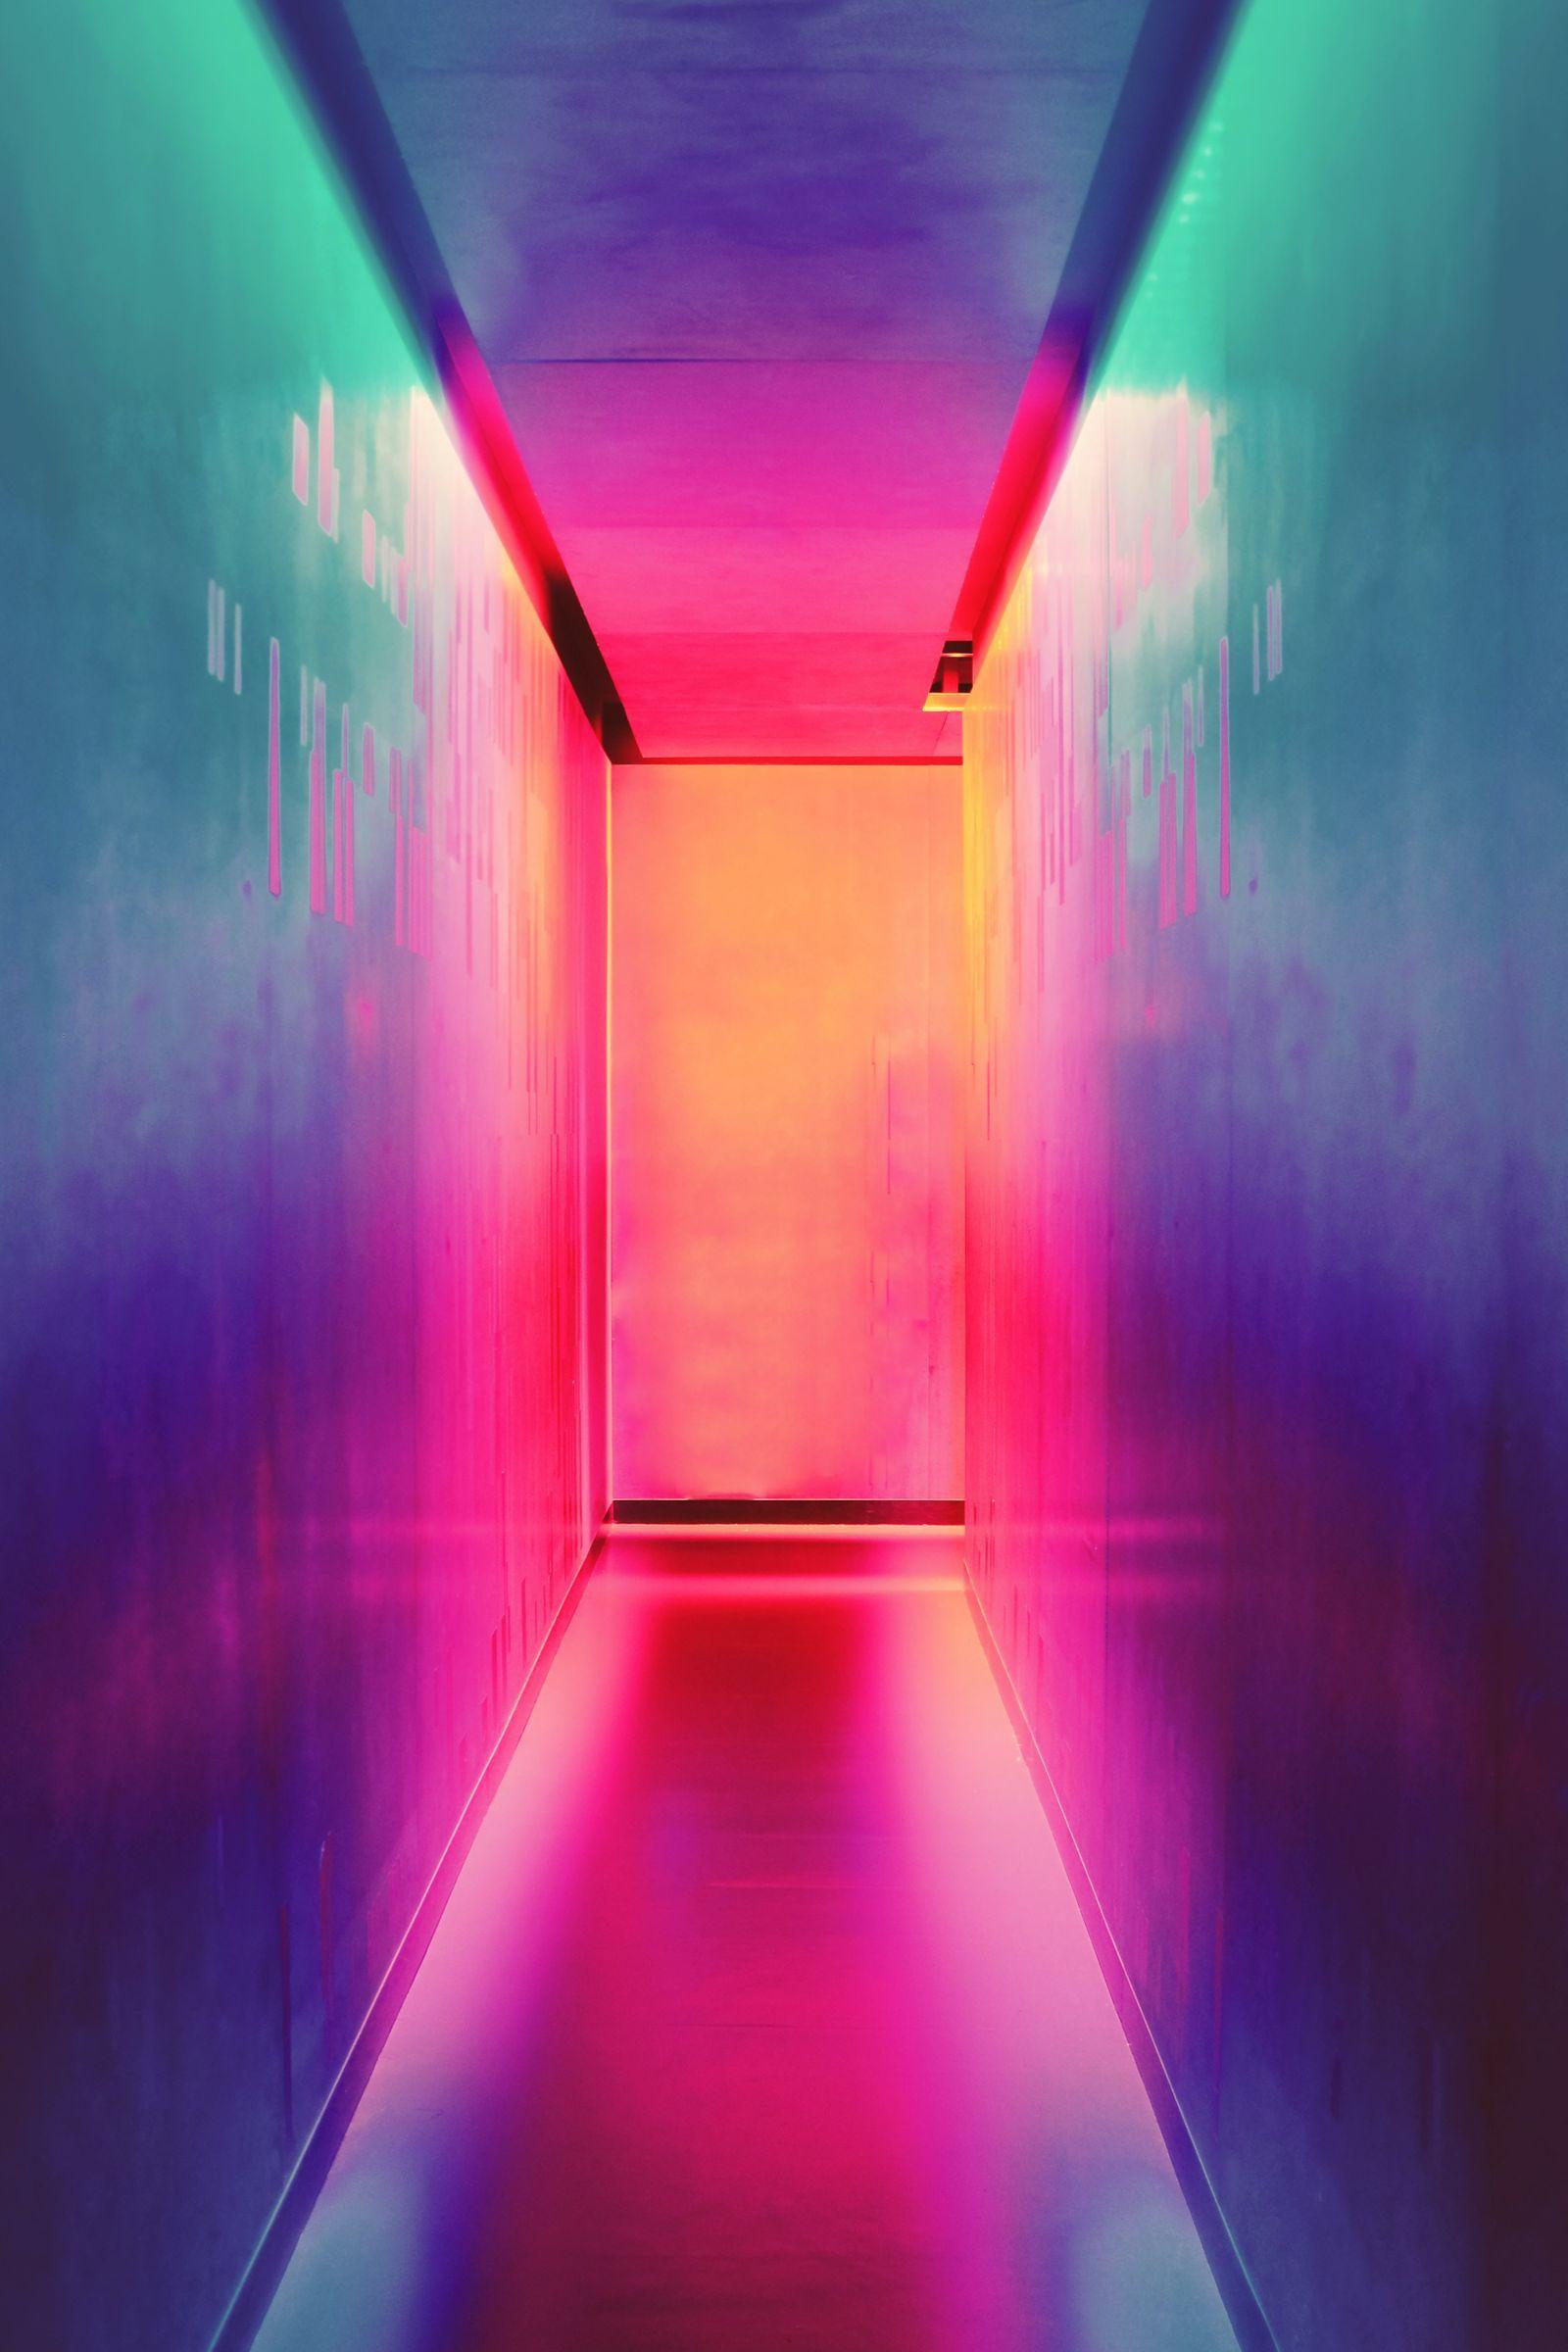 A colourful hallway. Photo by Efe Kurnaz on Unsplash